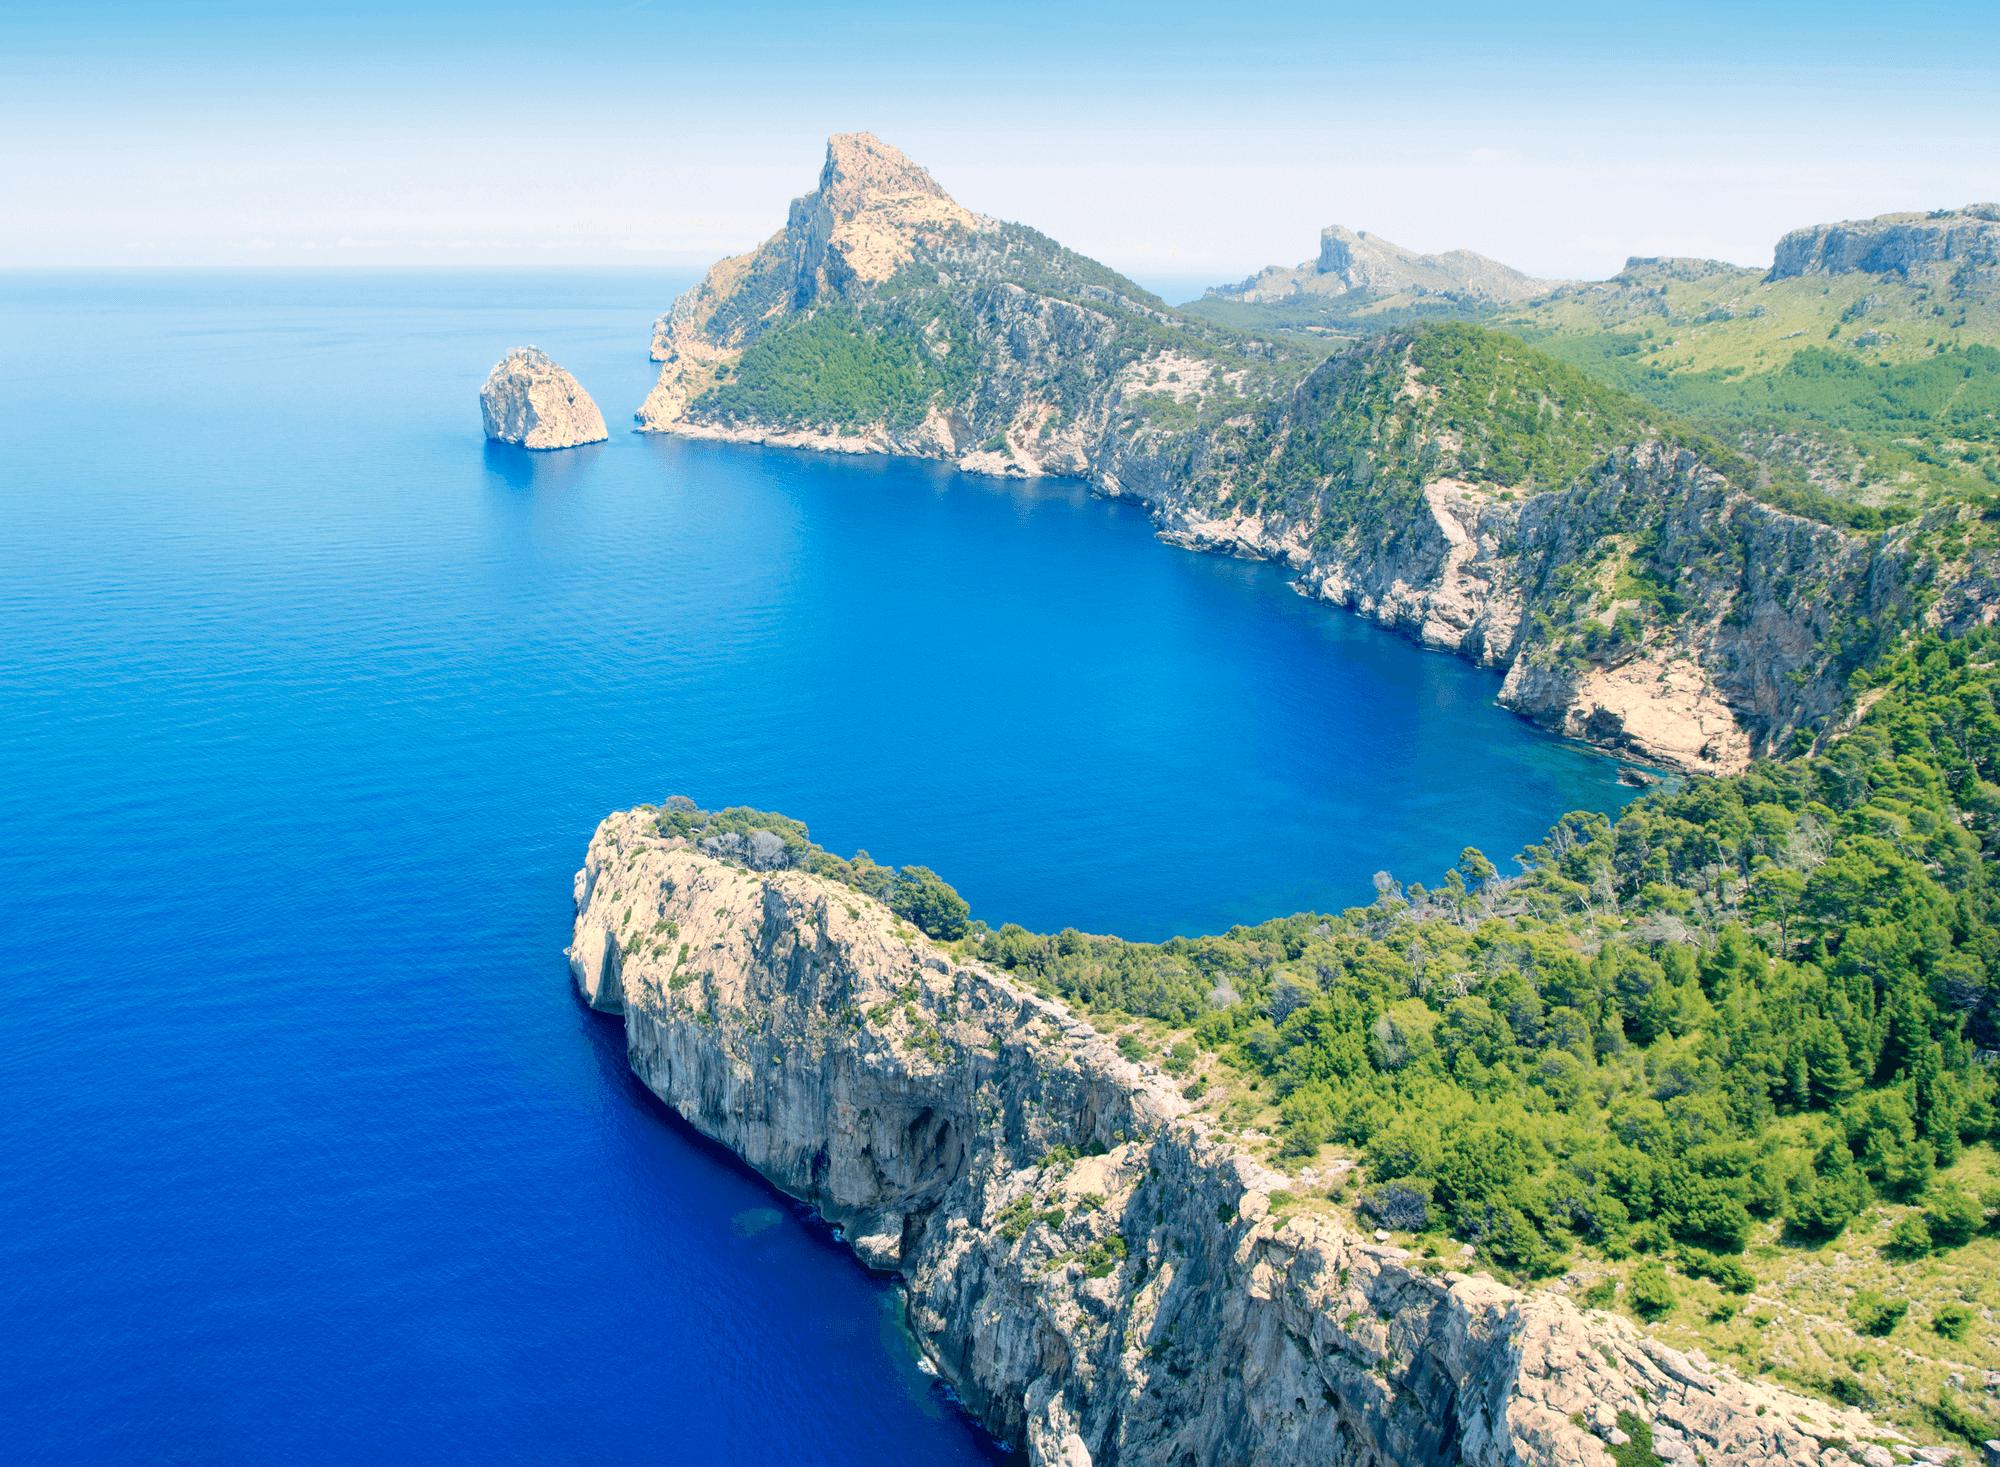 Am Cap Formentor fällt das Tramuntana-Gebirge jäh ins Mittelmeer ab